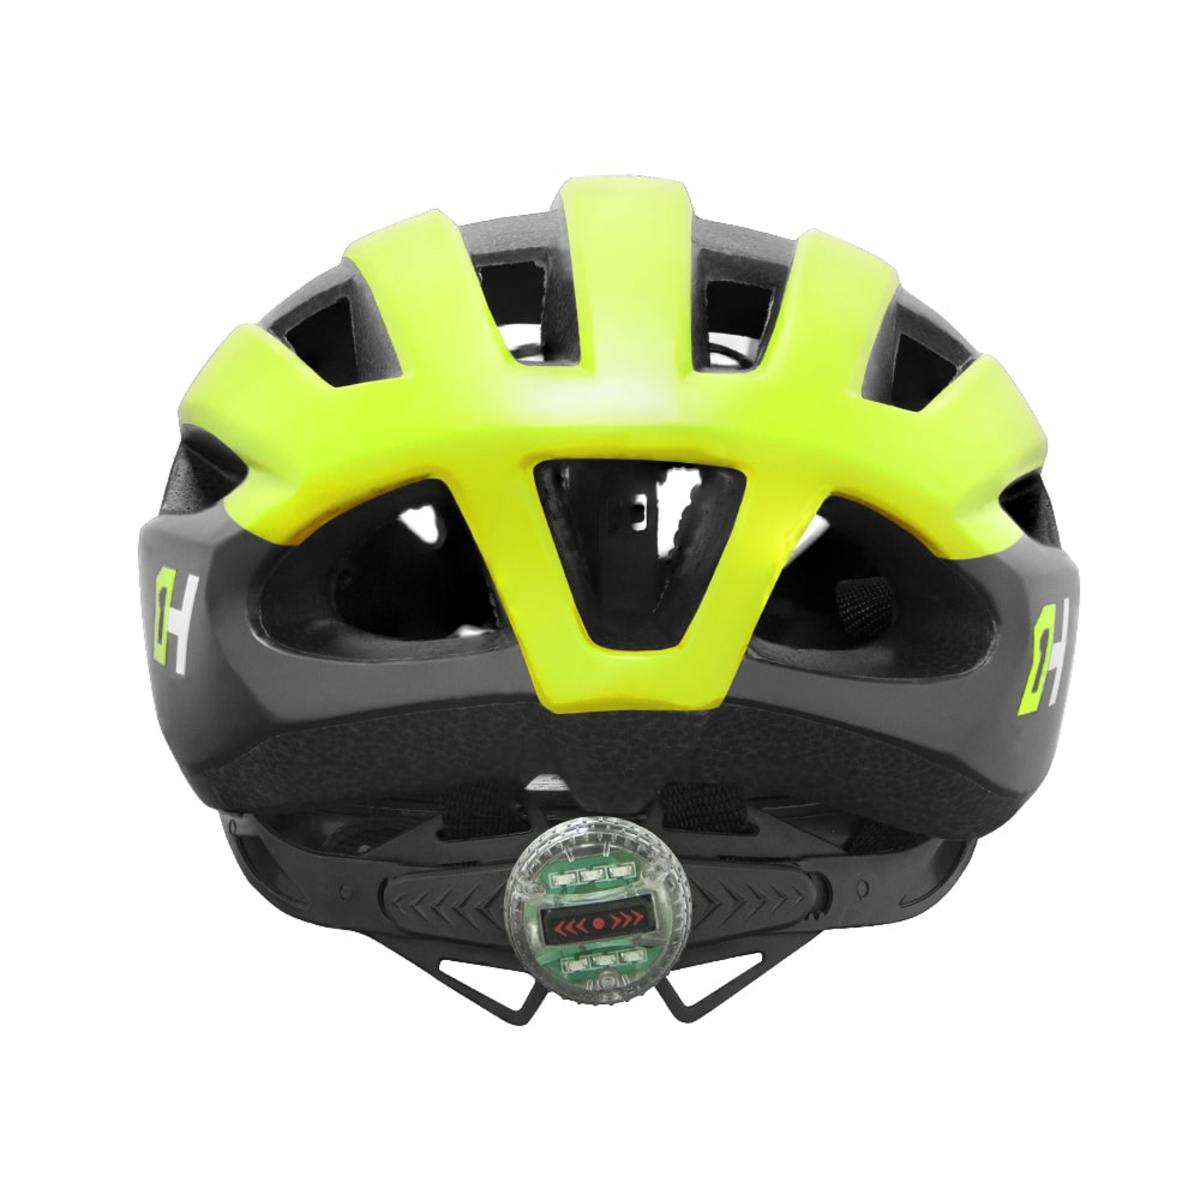 Capacete High One WIND AERO Mtb/Speed - Preto/Verde Neon